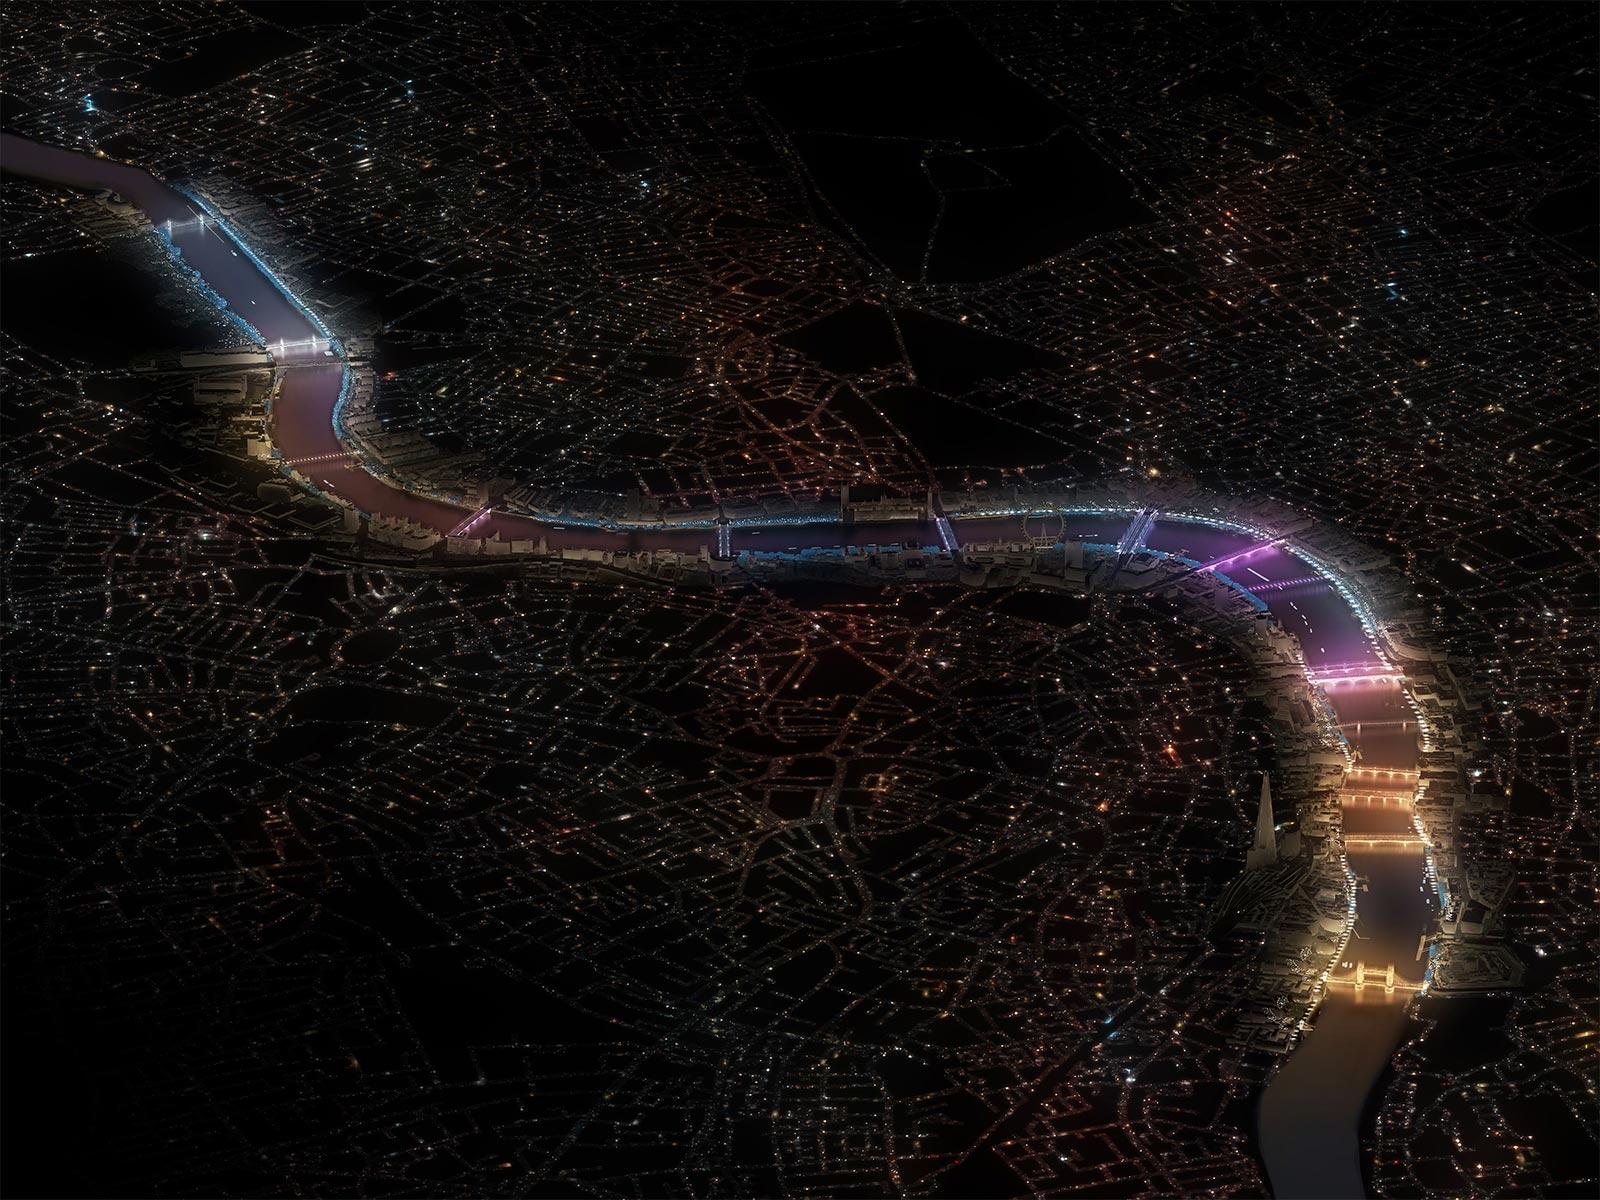 Artist Leo Villareal and Lifschutz Davidson Sandilands have won the Illuminated River International Design Competition.